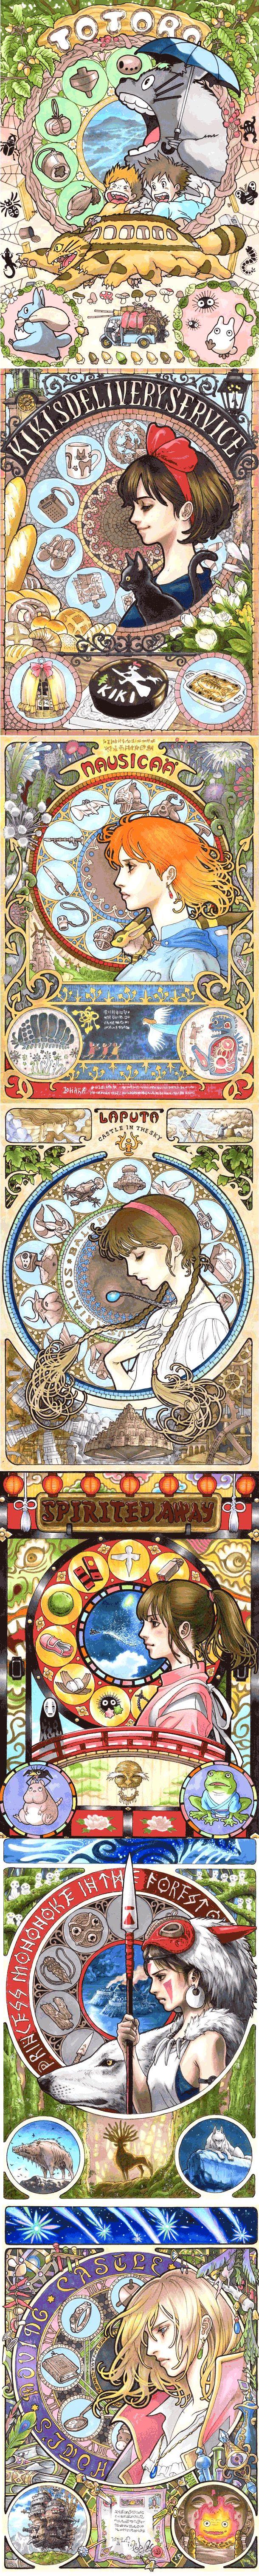 Studio Ghibli Art Nouveau by Takumi http://www.pixiv.net/member.php?id=4873996